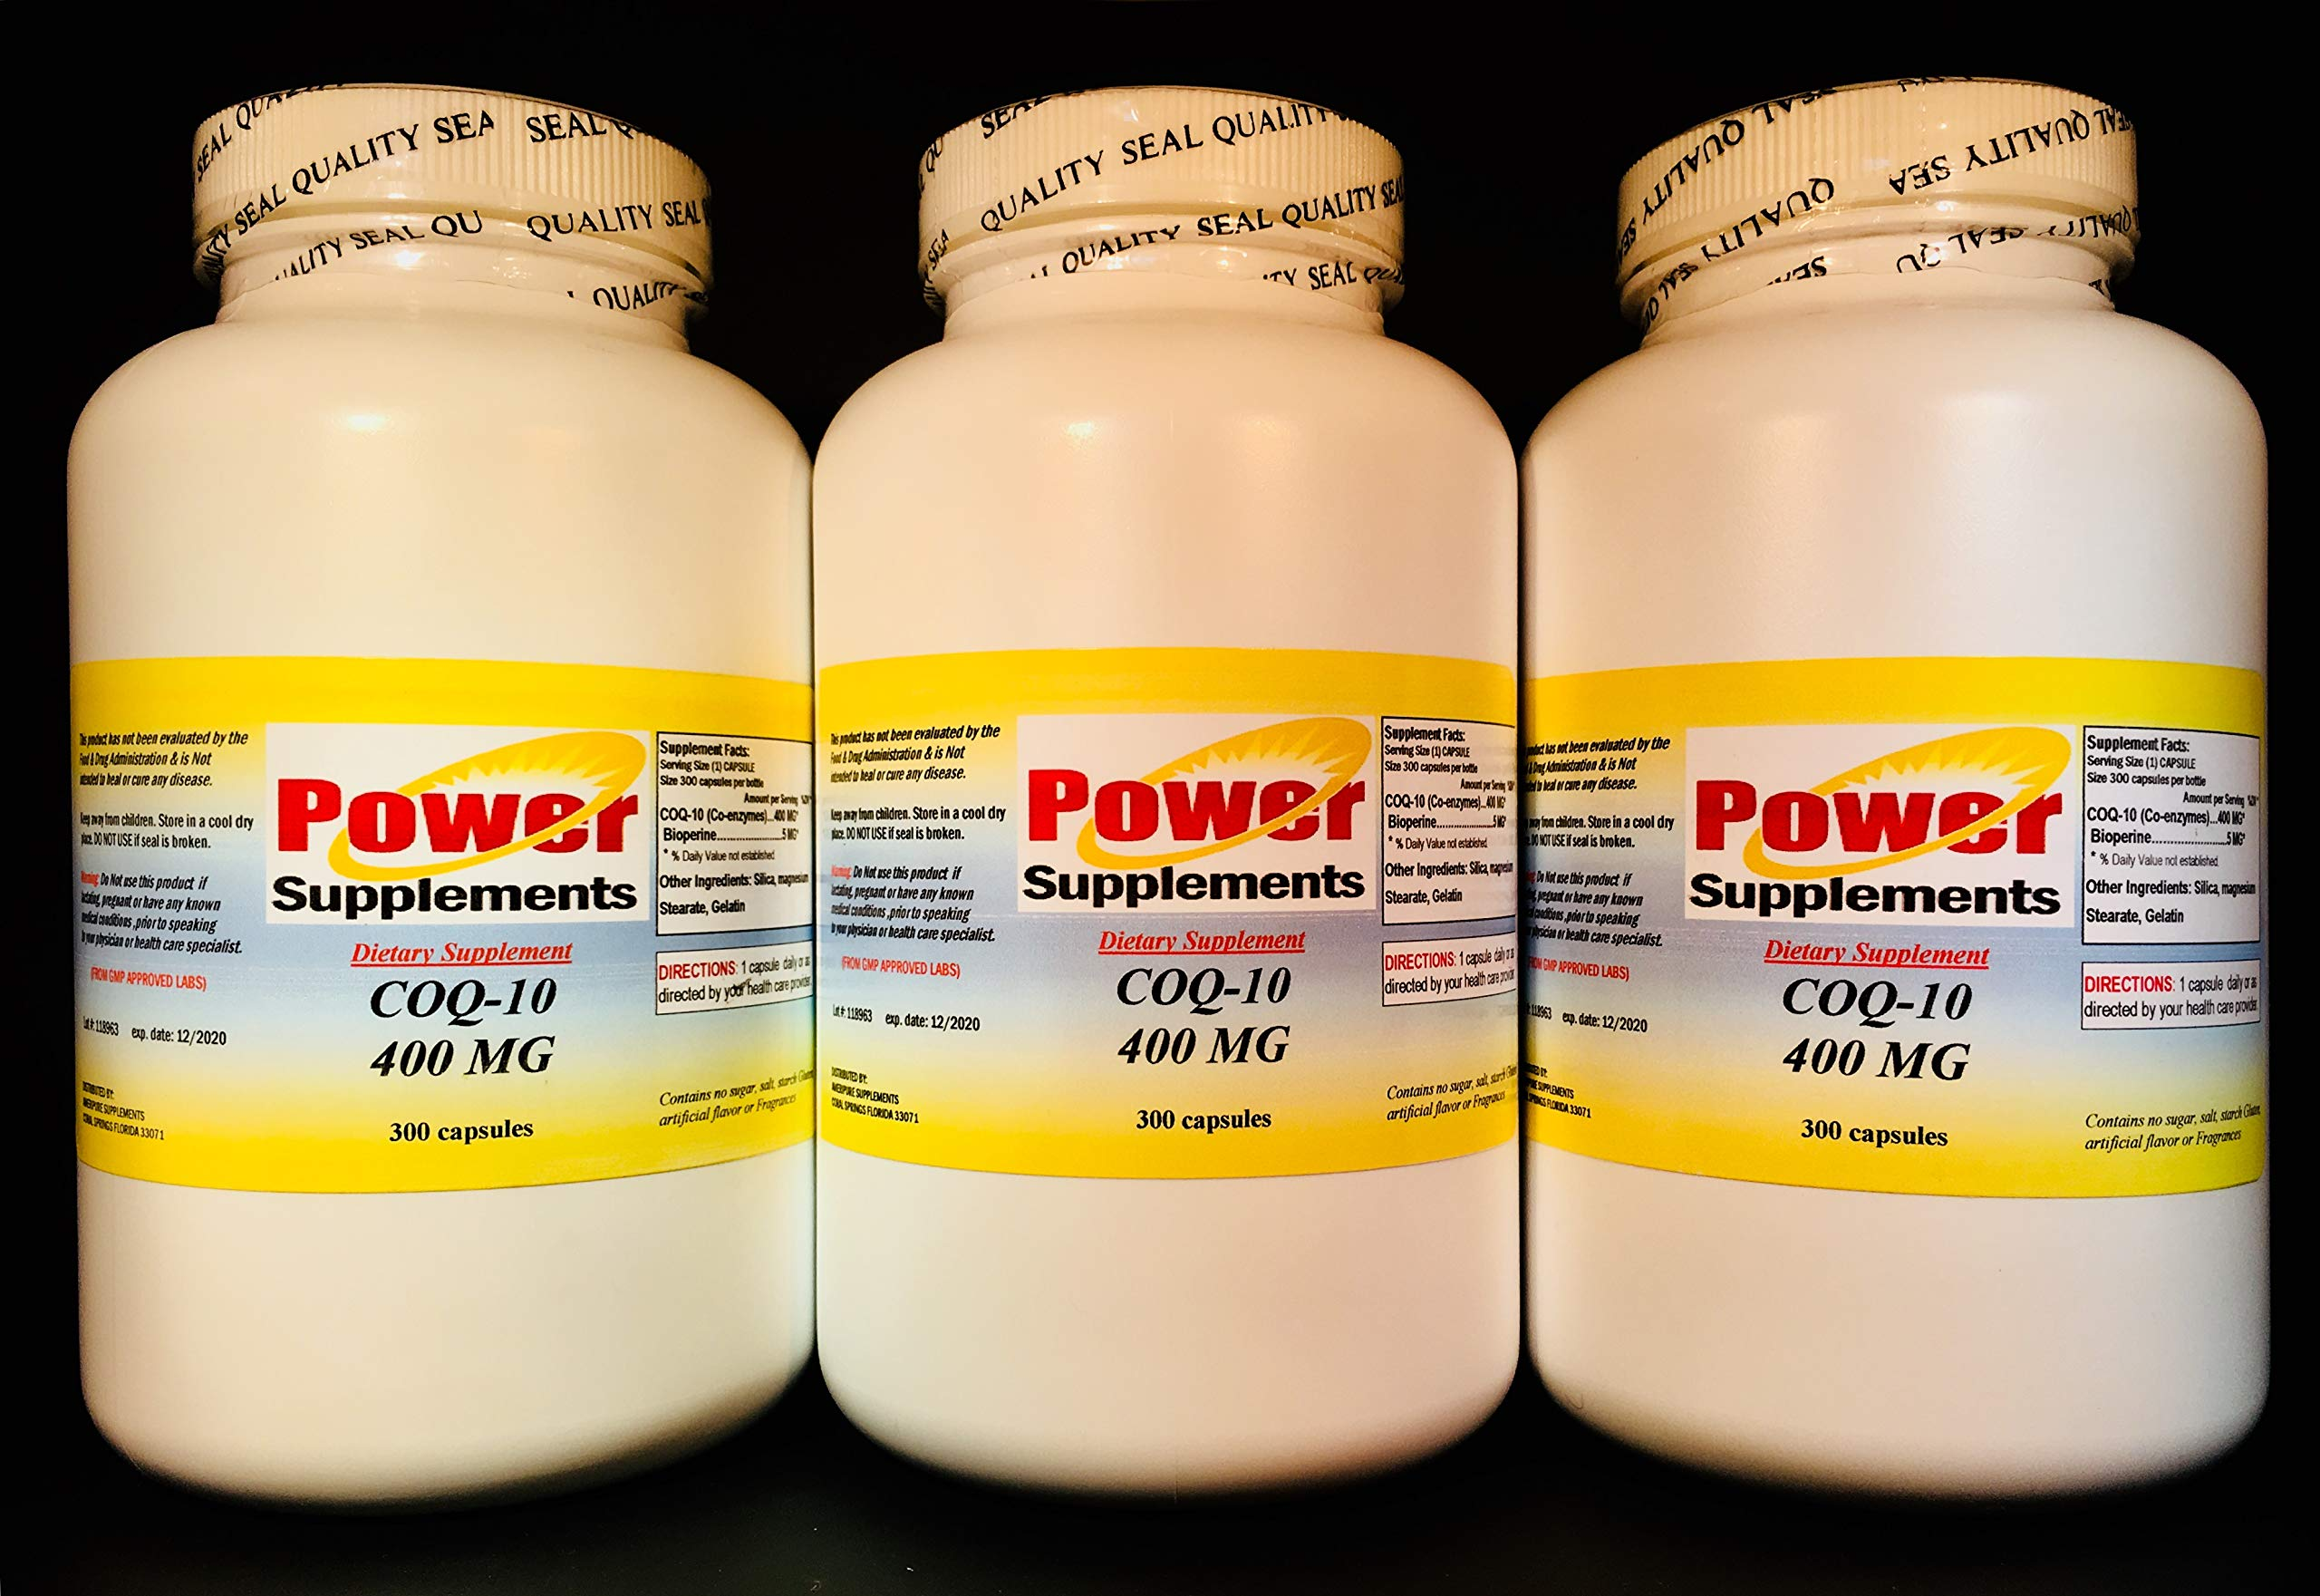 CoQ-10 q10 co-Enzyme, Anti-Aging 400mg - 900 (3x300) Capsules